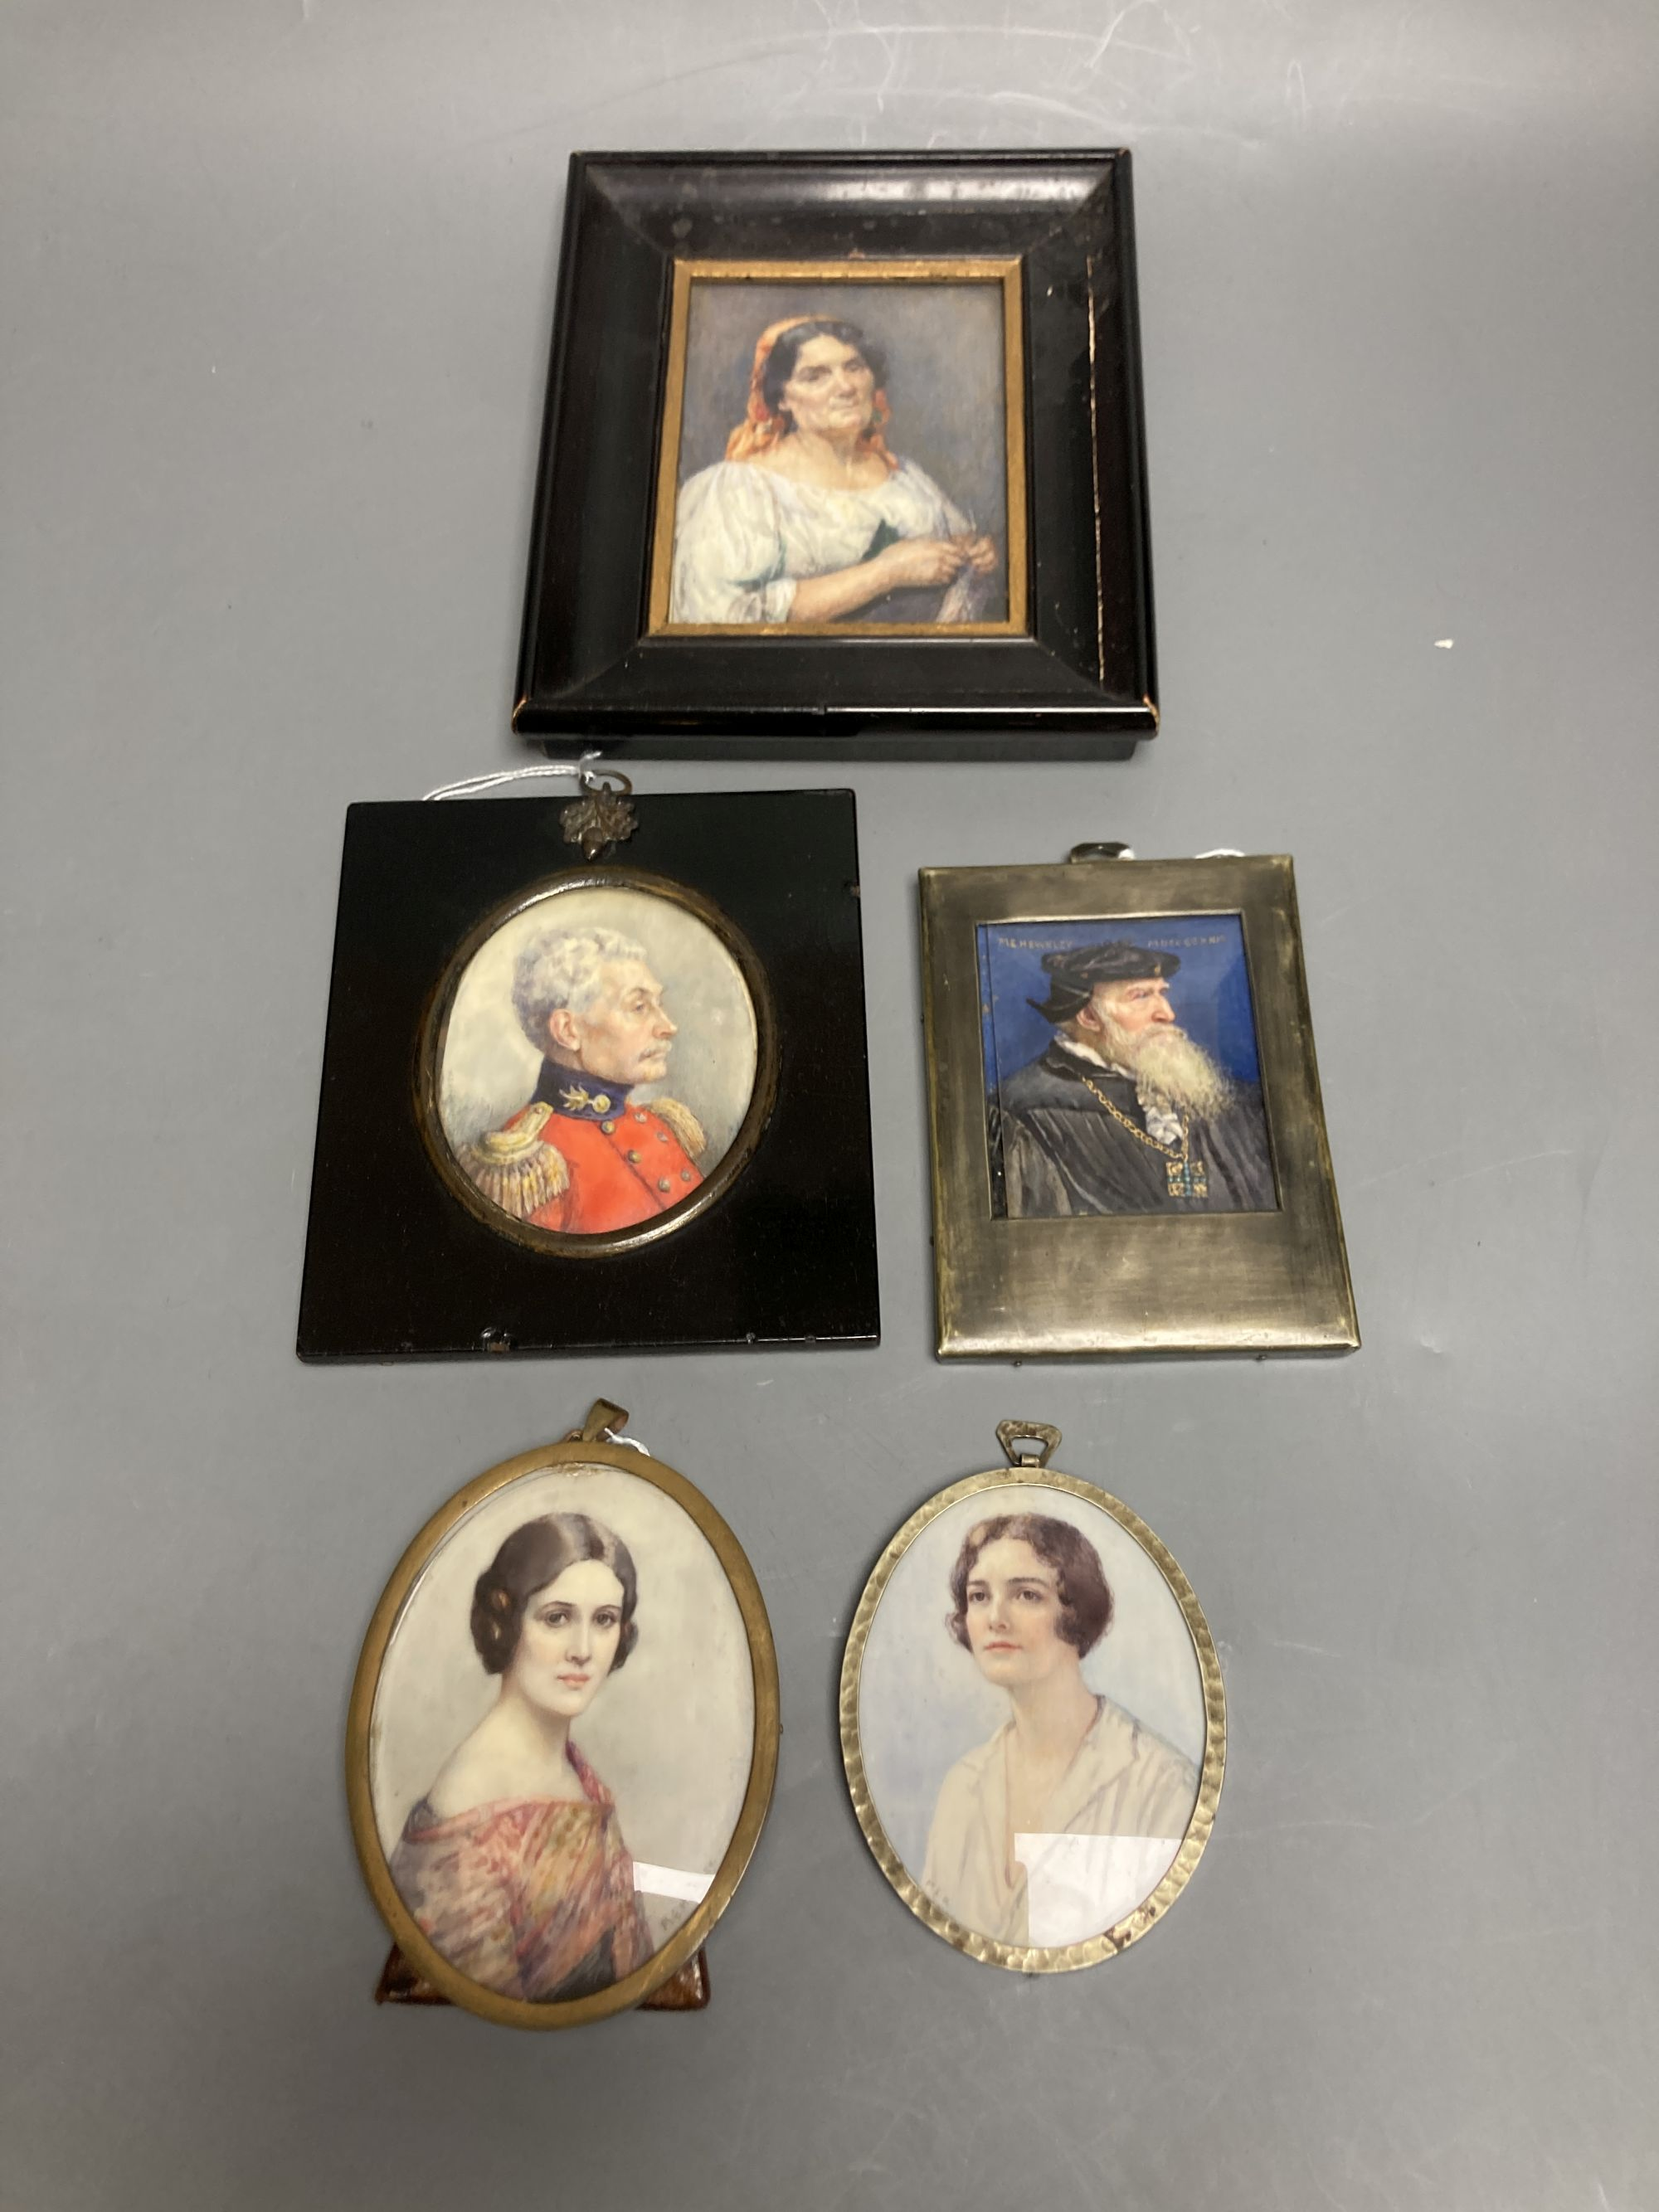 Marion Edith Hewkley (aka Sutherland Gill,19th/20th century), five miniature portraits, circa